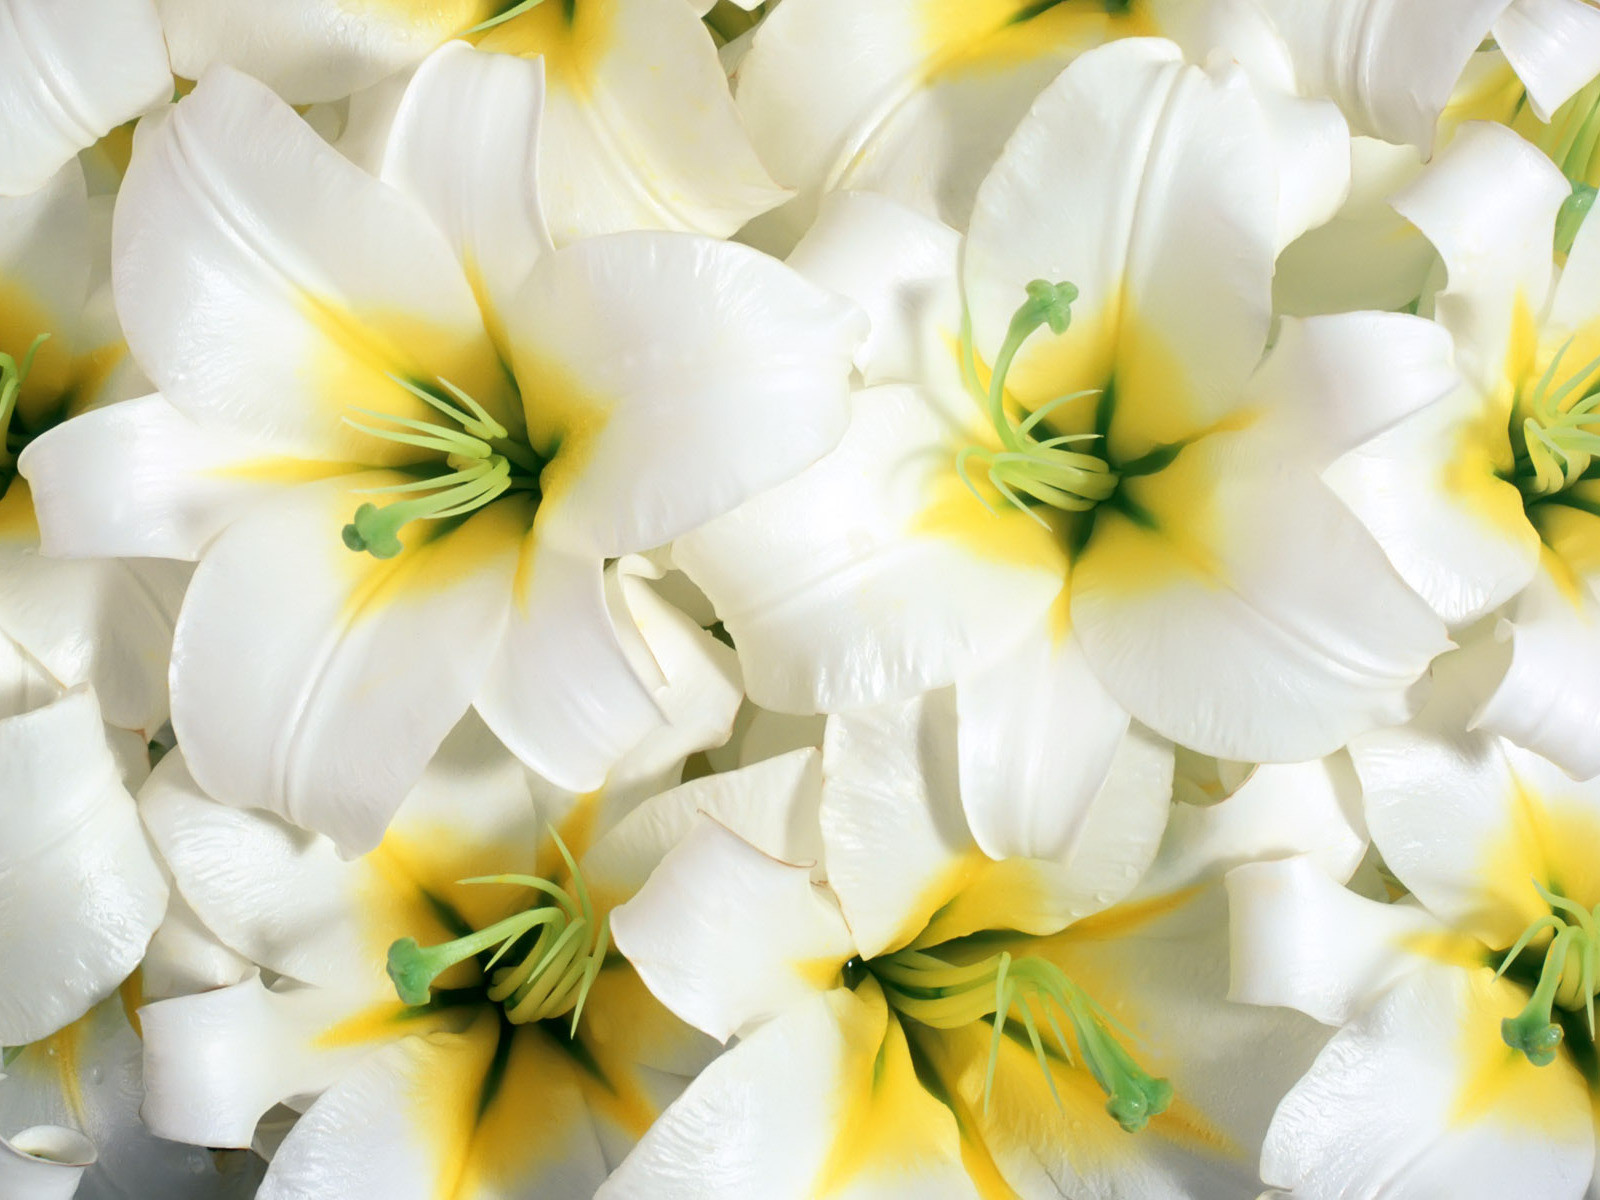 Beautiful flowers wallpapers latest news - Beautiful flower images wallpapers ...